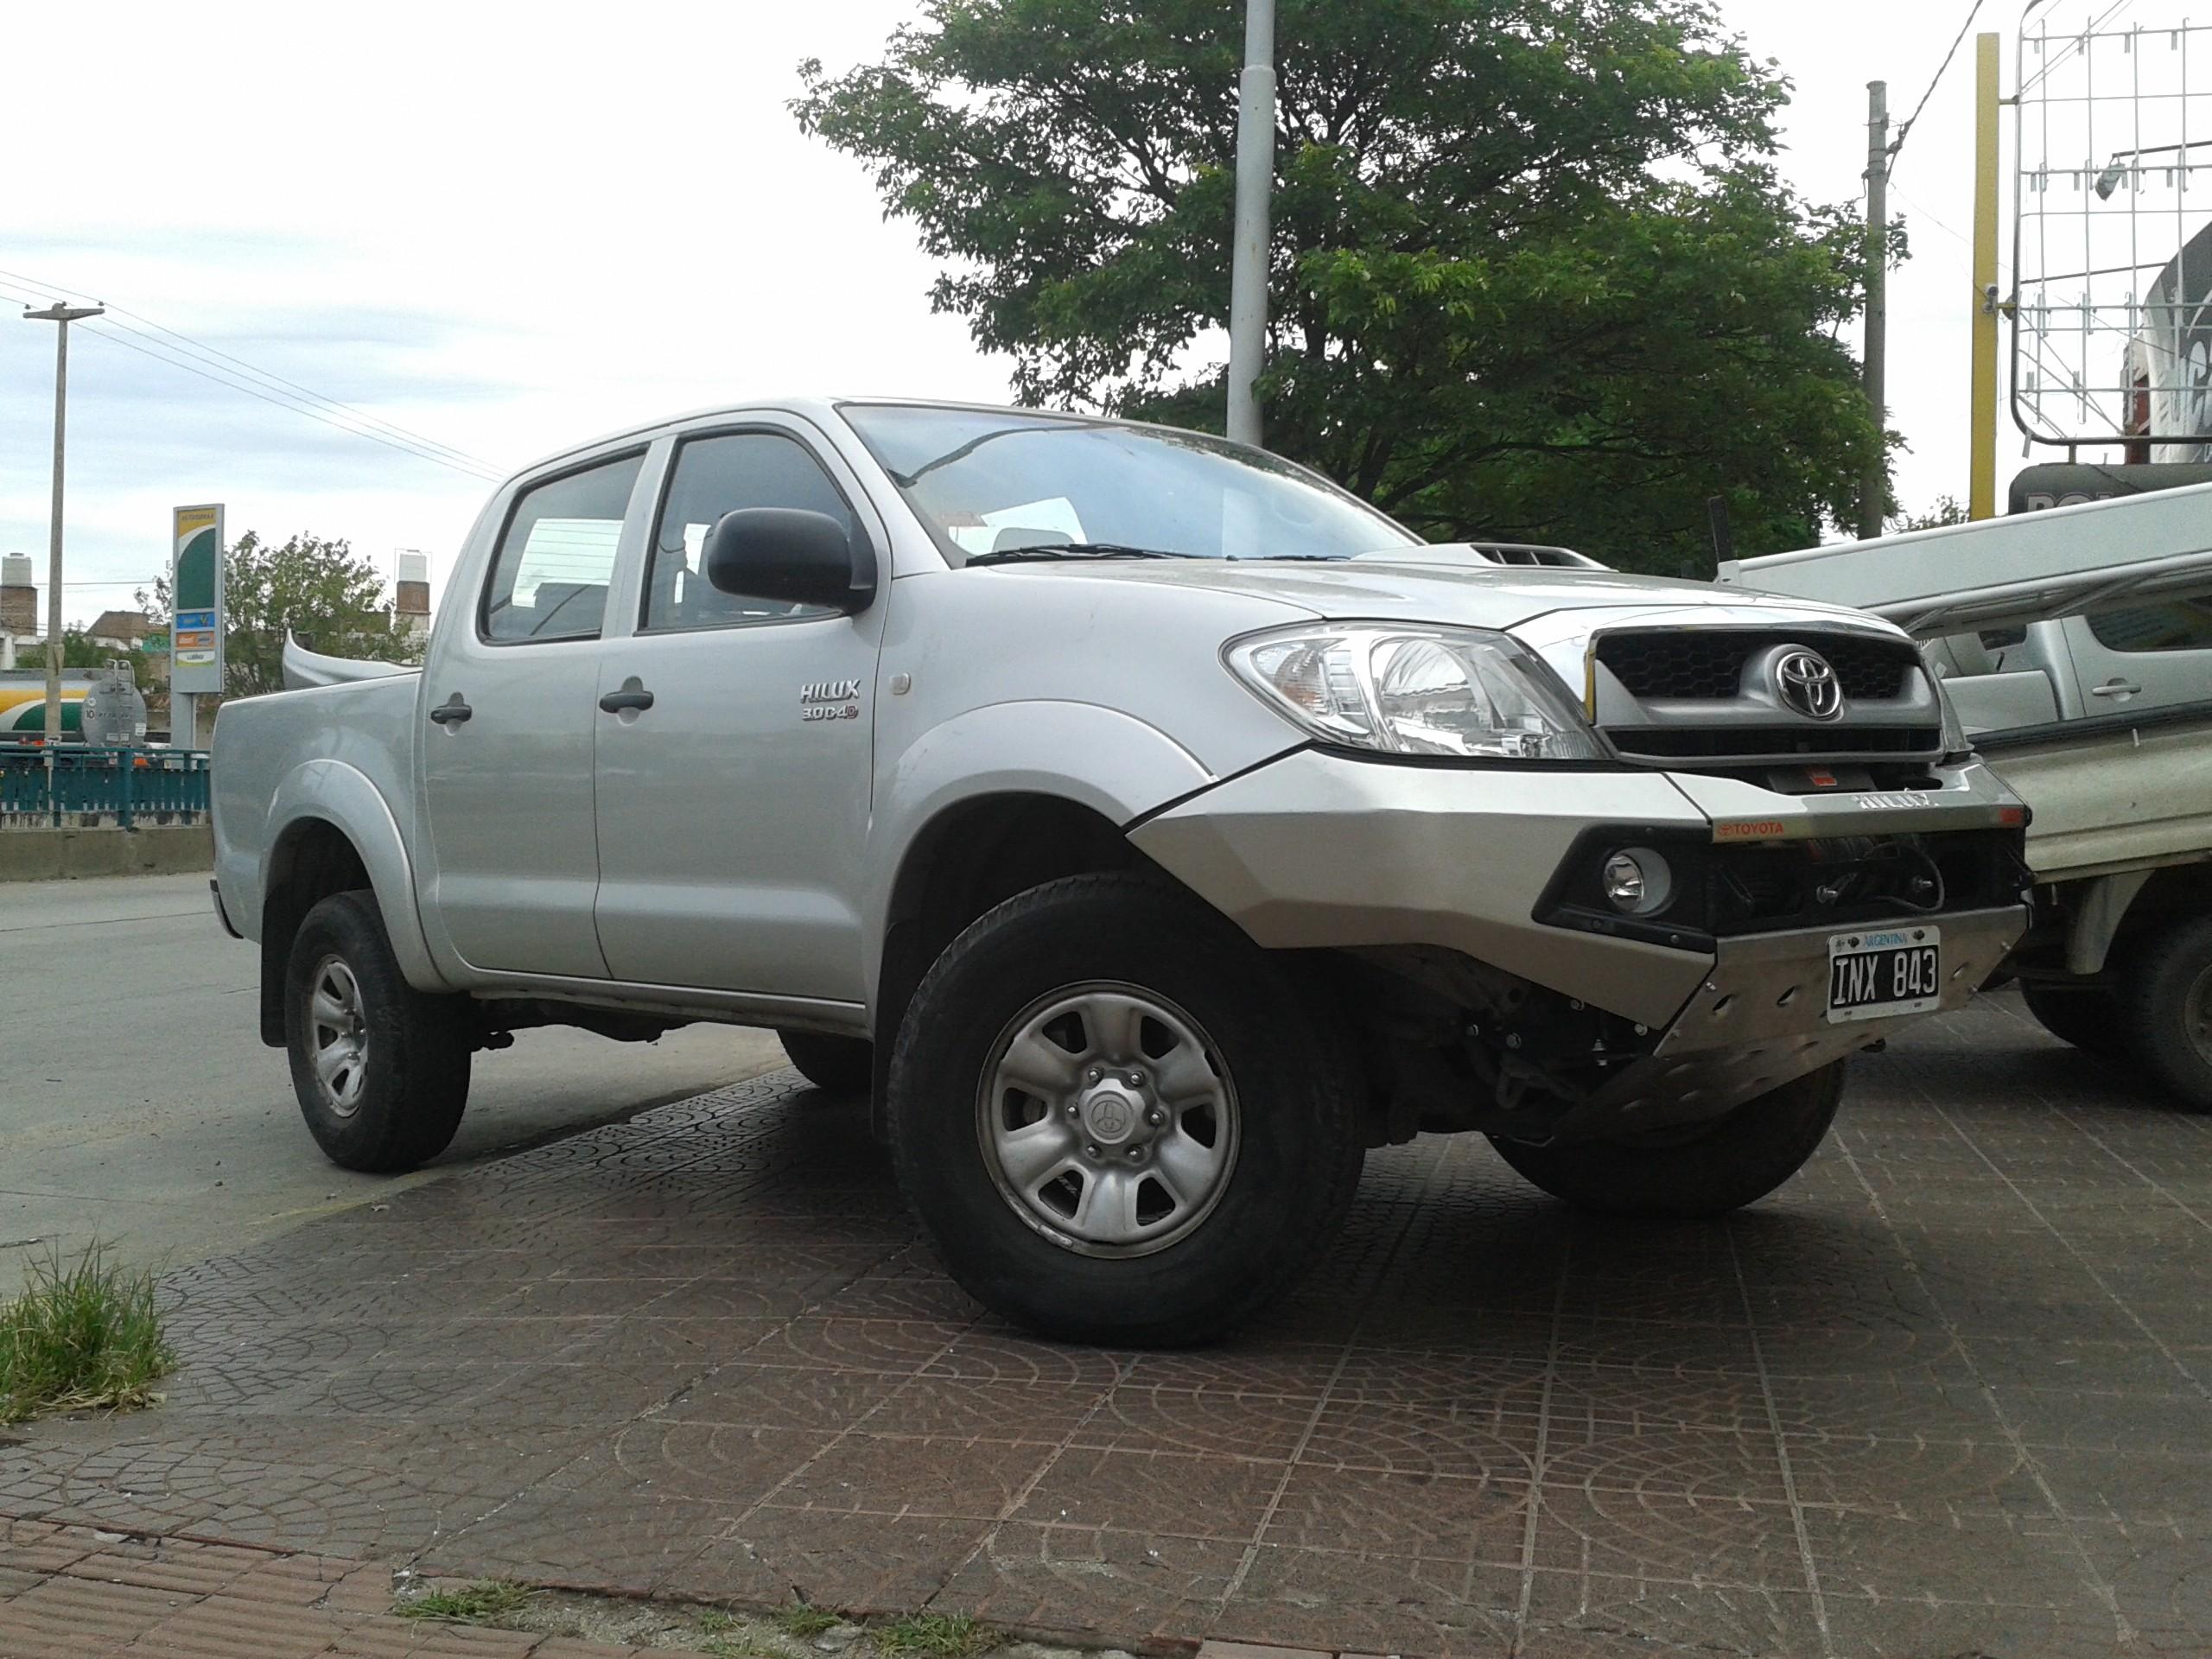 Kelebihan Kekurangan Toyota Hilux 2005 Review